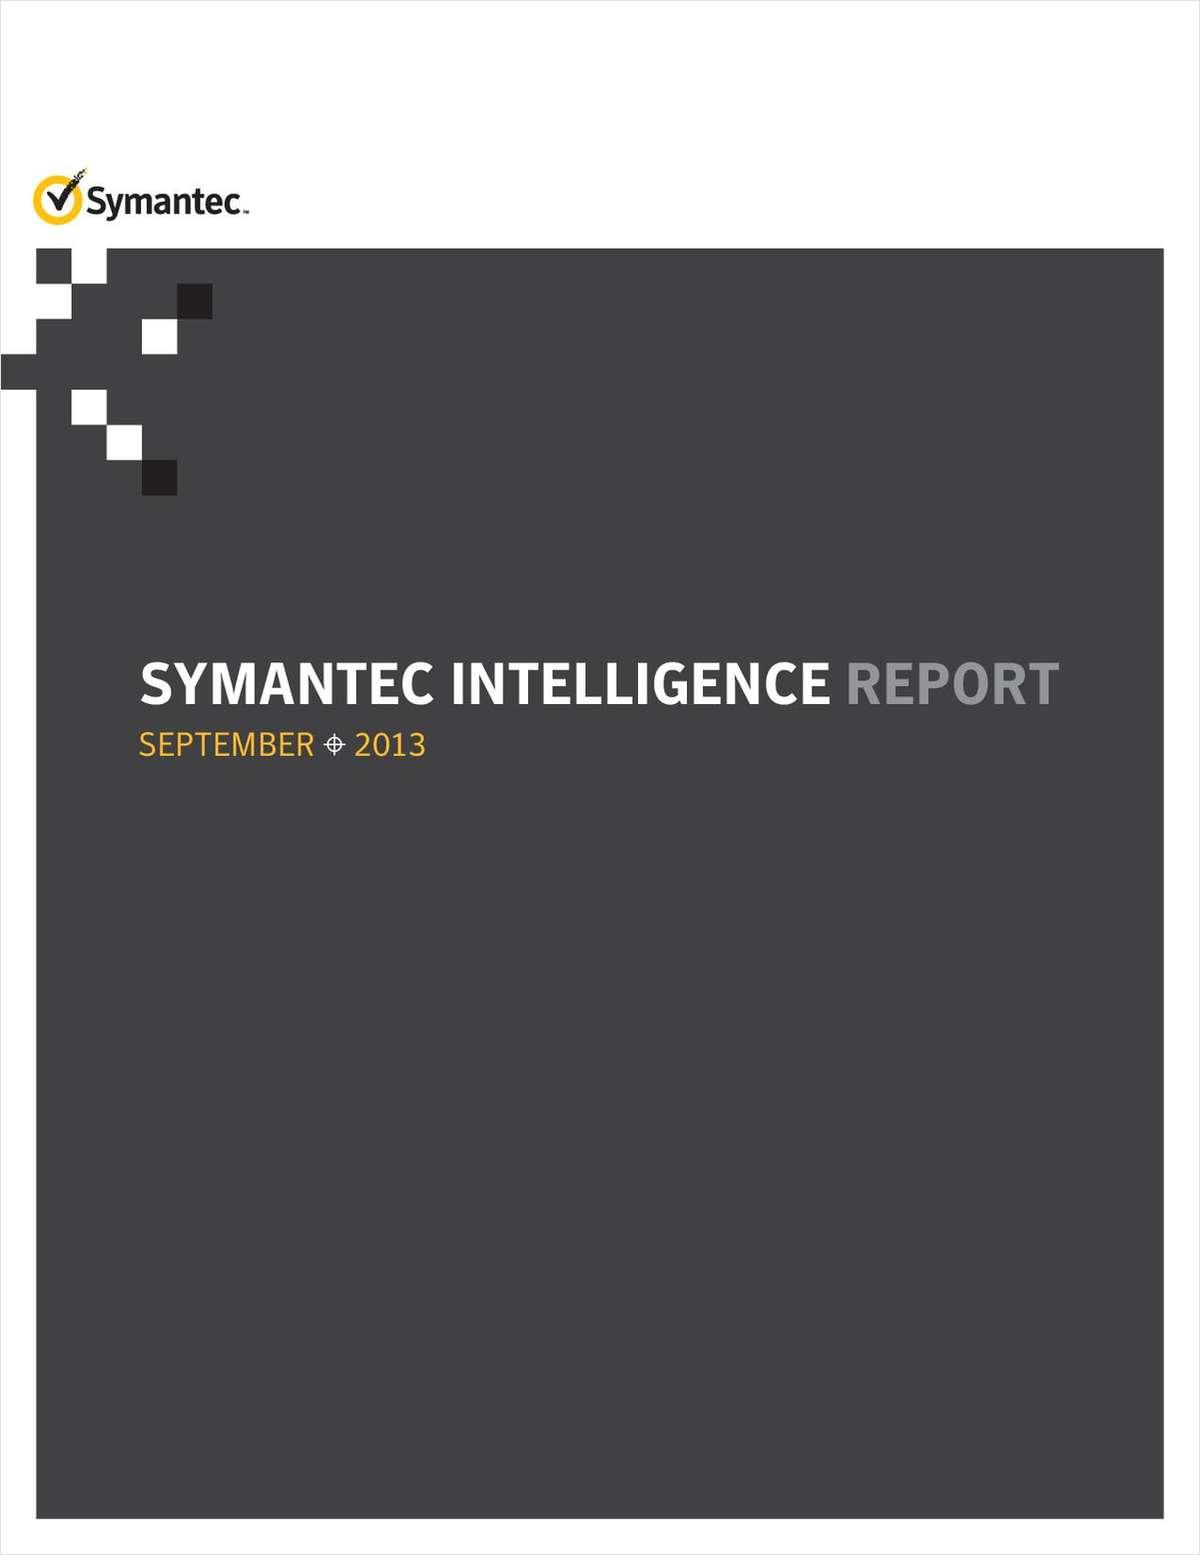 Symantec Intelligence Report September 2013